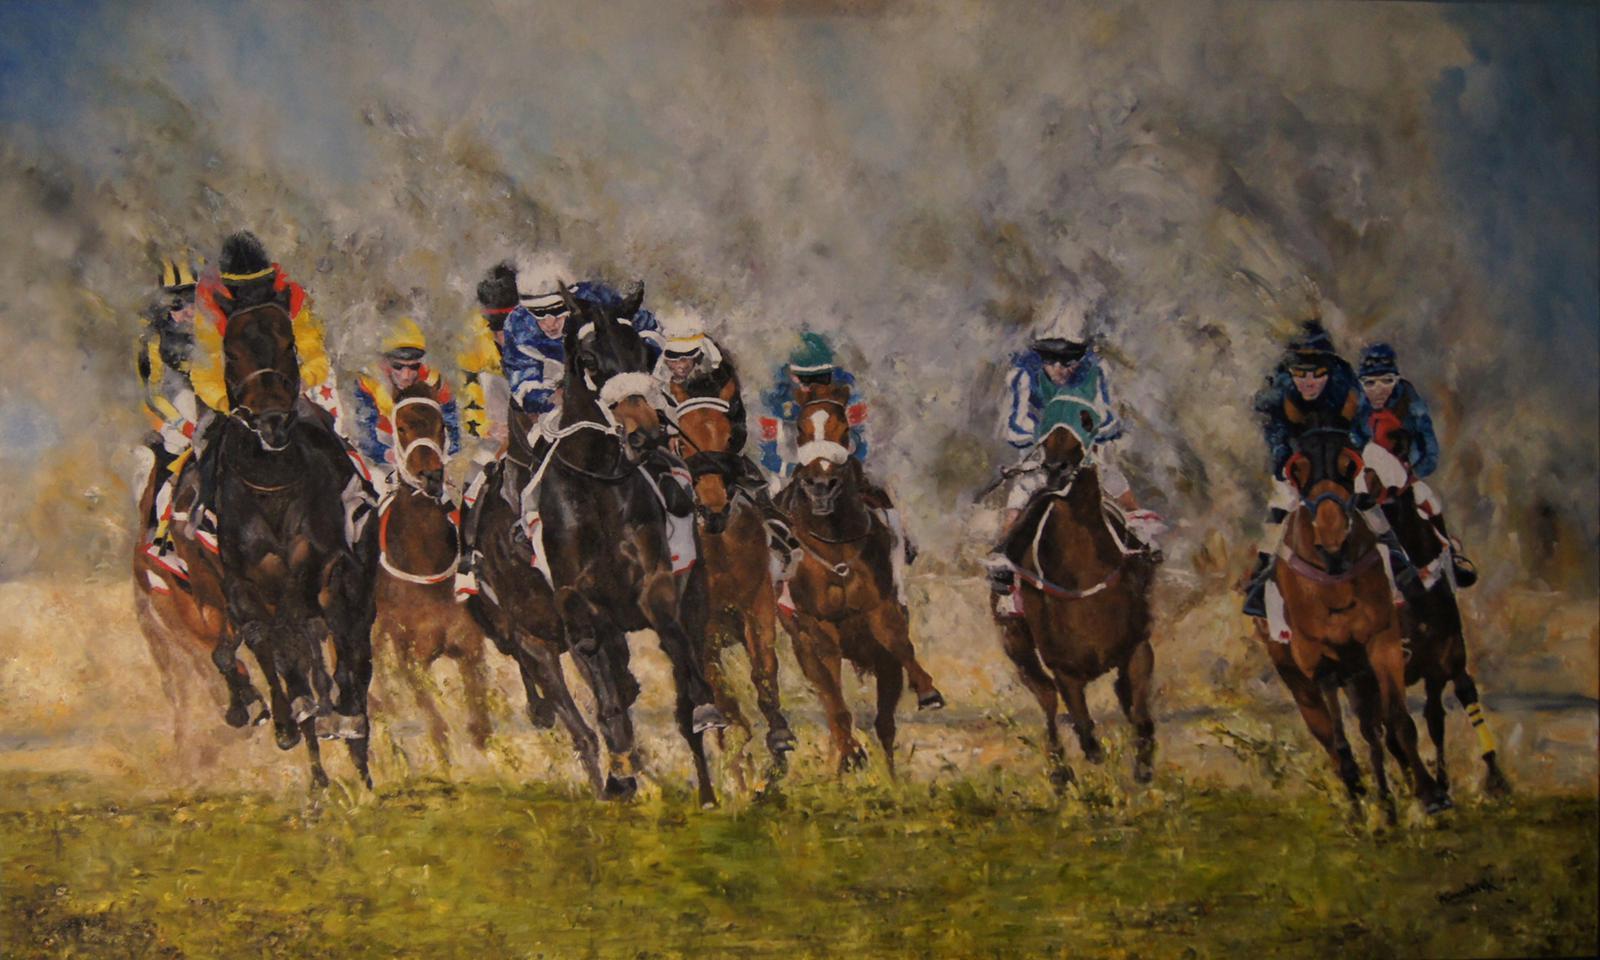 'Horseracing in Bahrain'